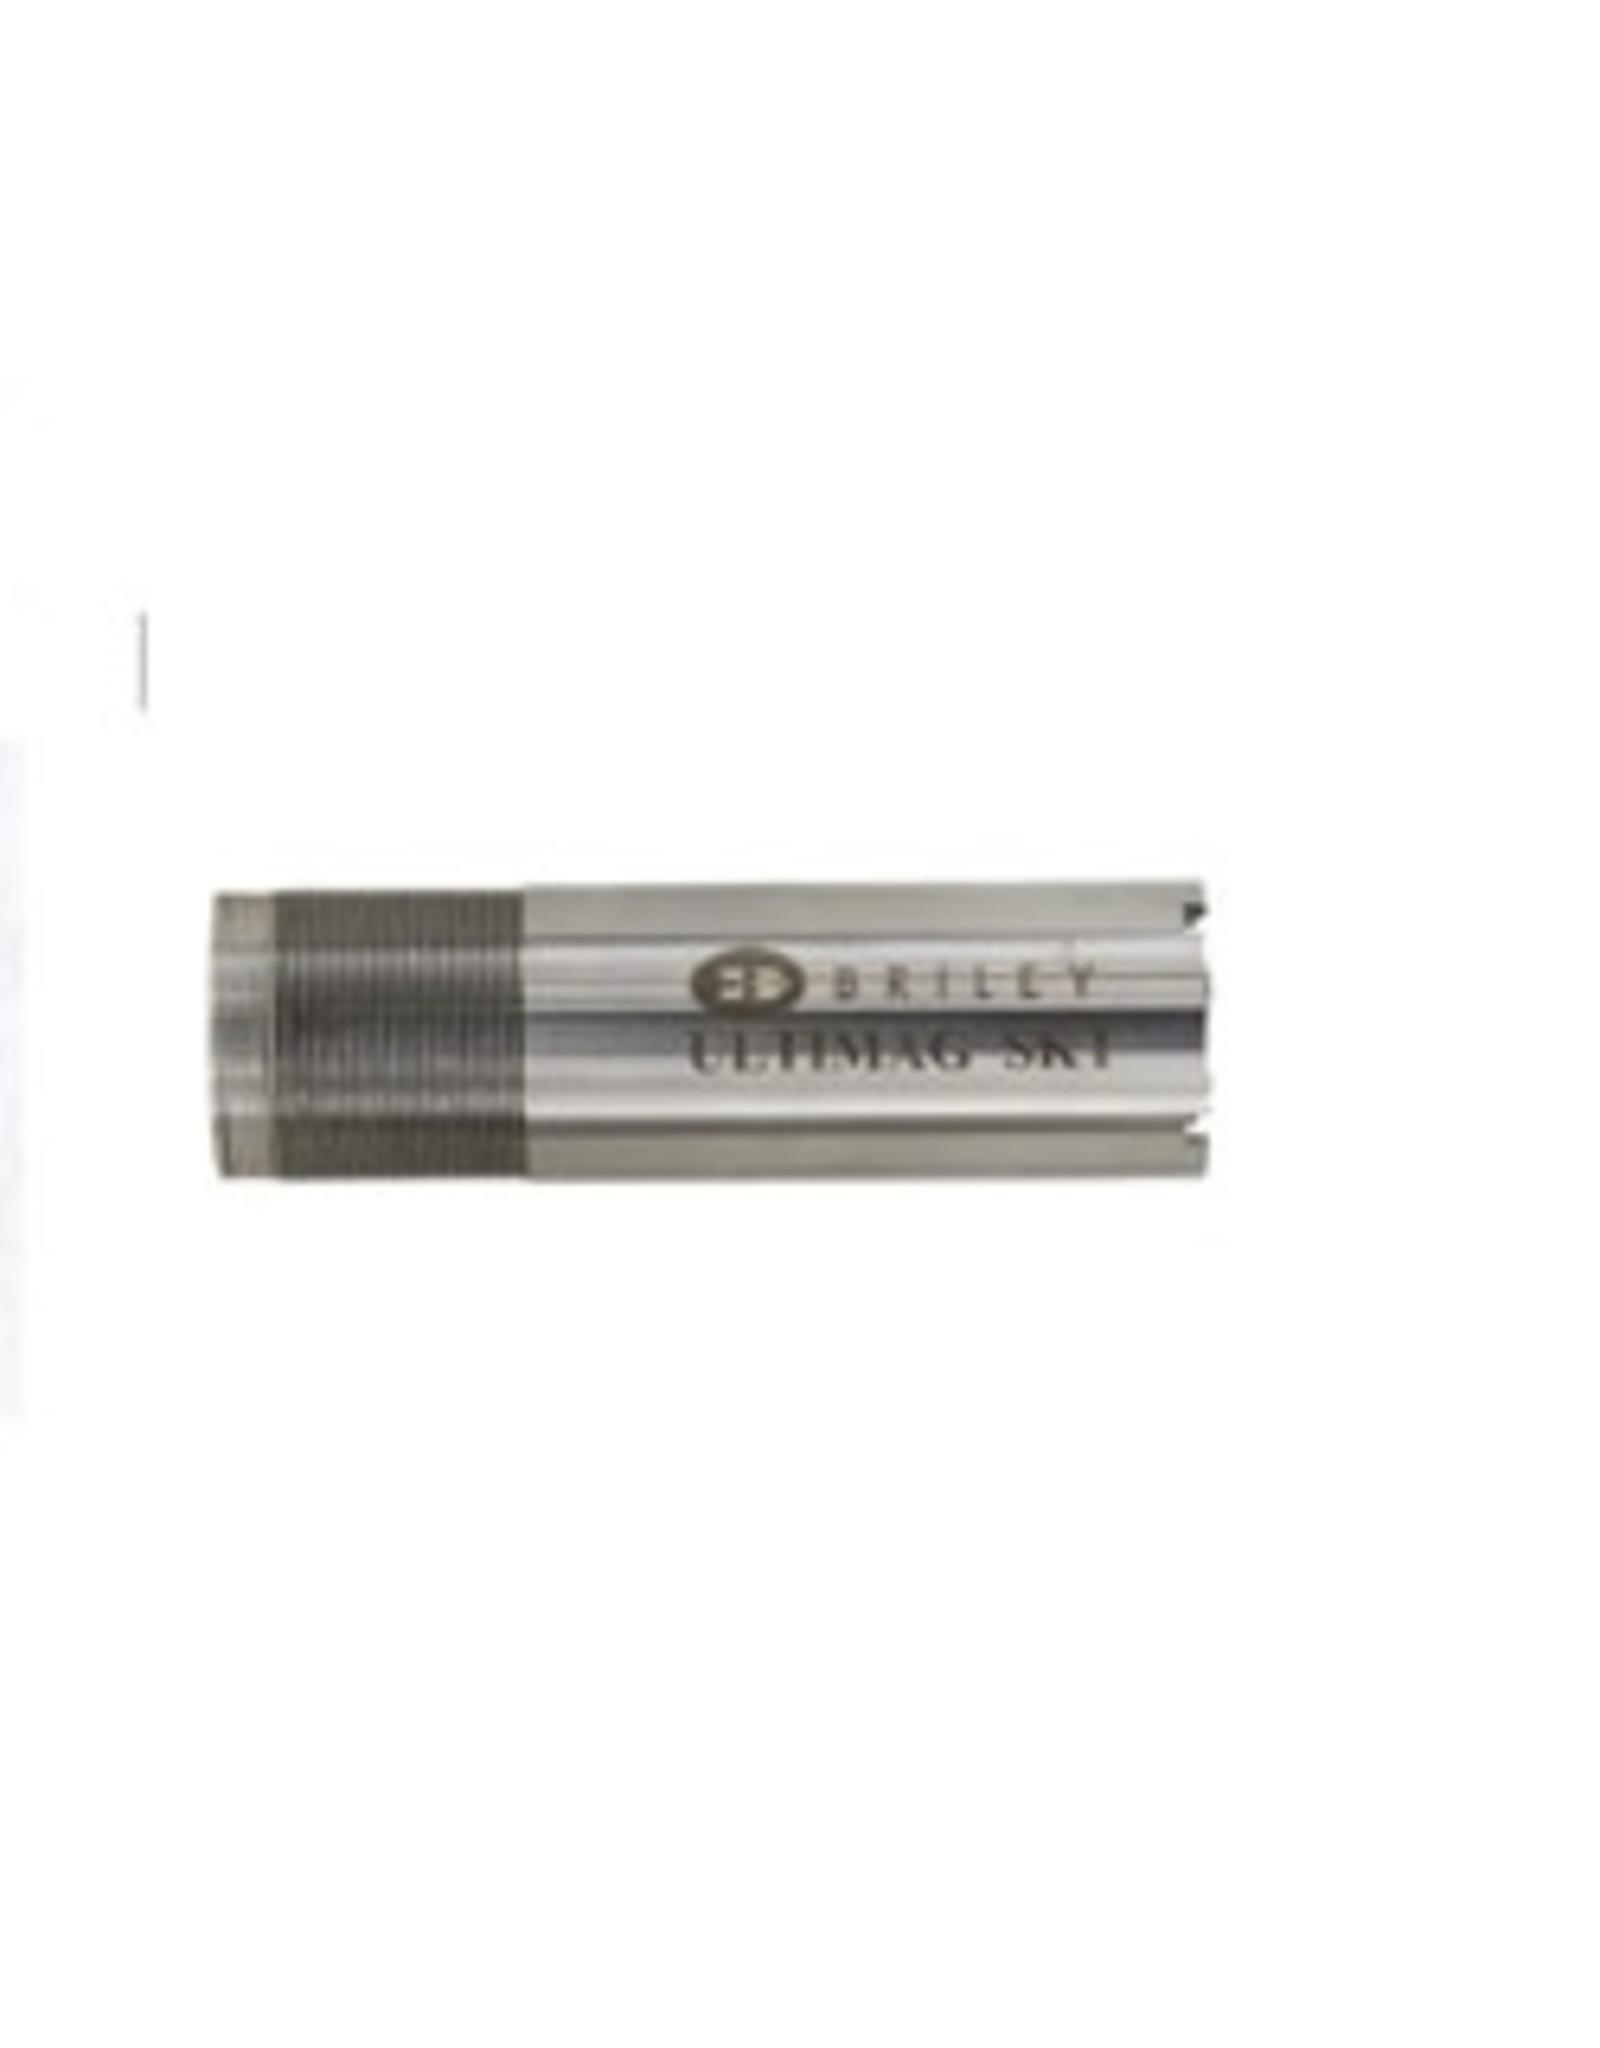 Briley 12 Ga Flush Mossberg Ulit-Mag - Full